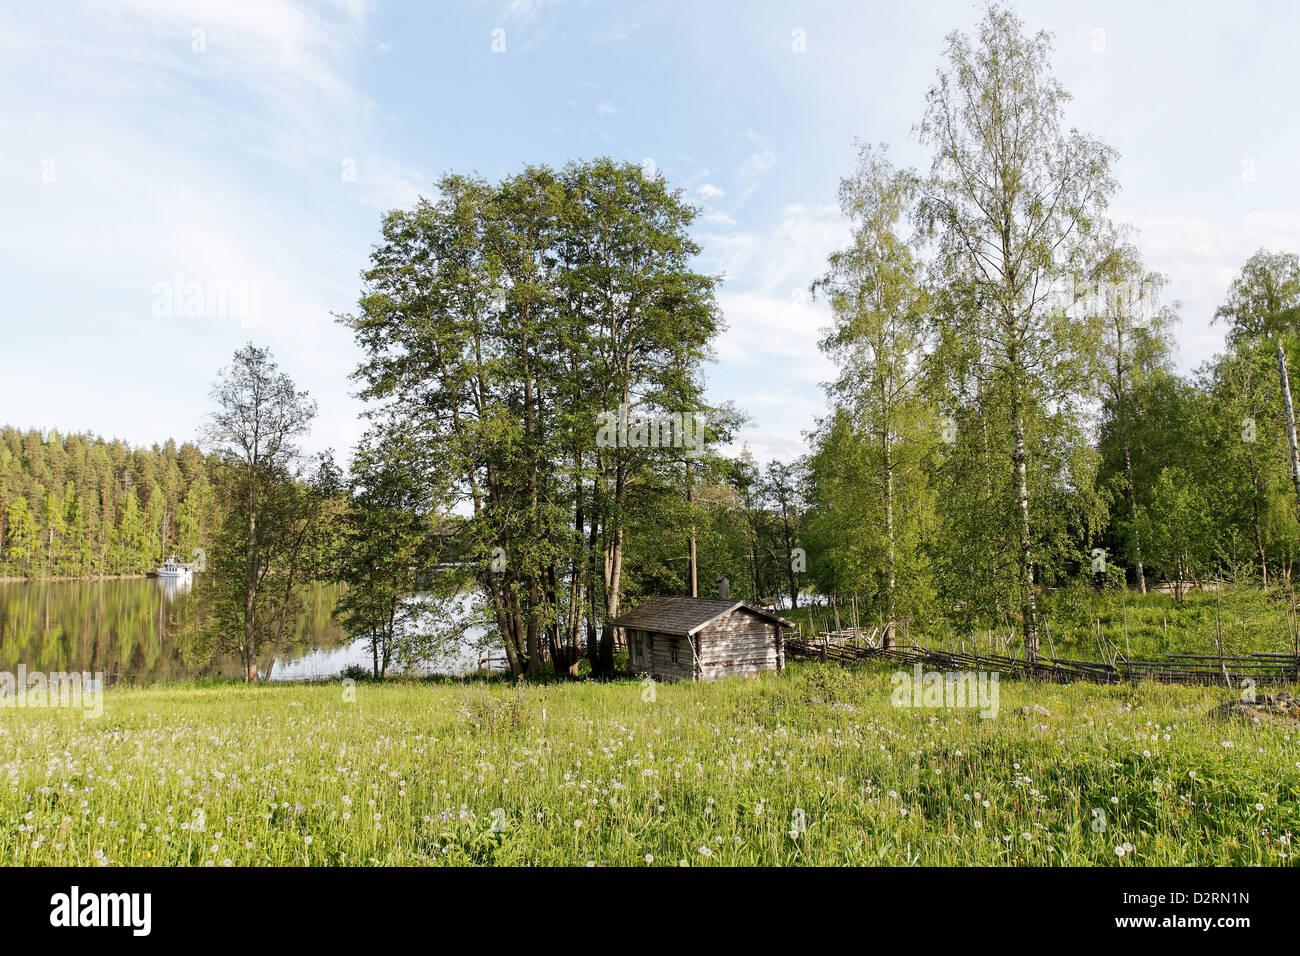 Linnansaari Croft on Linnansaari Island, Linnansaari National Park, Finland - Stock Image